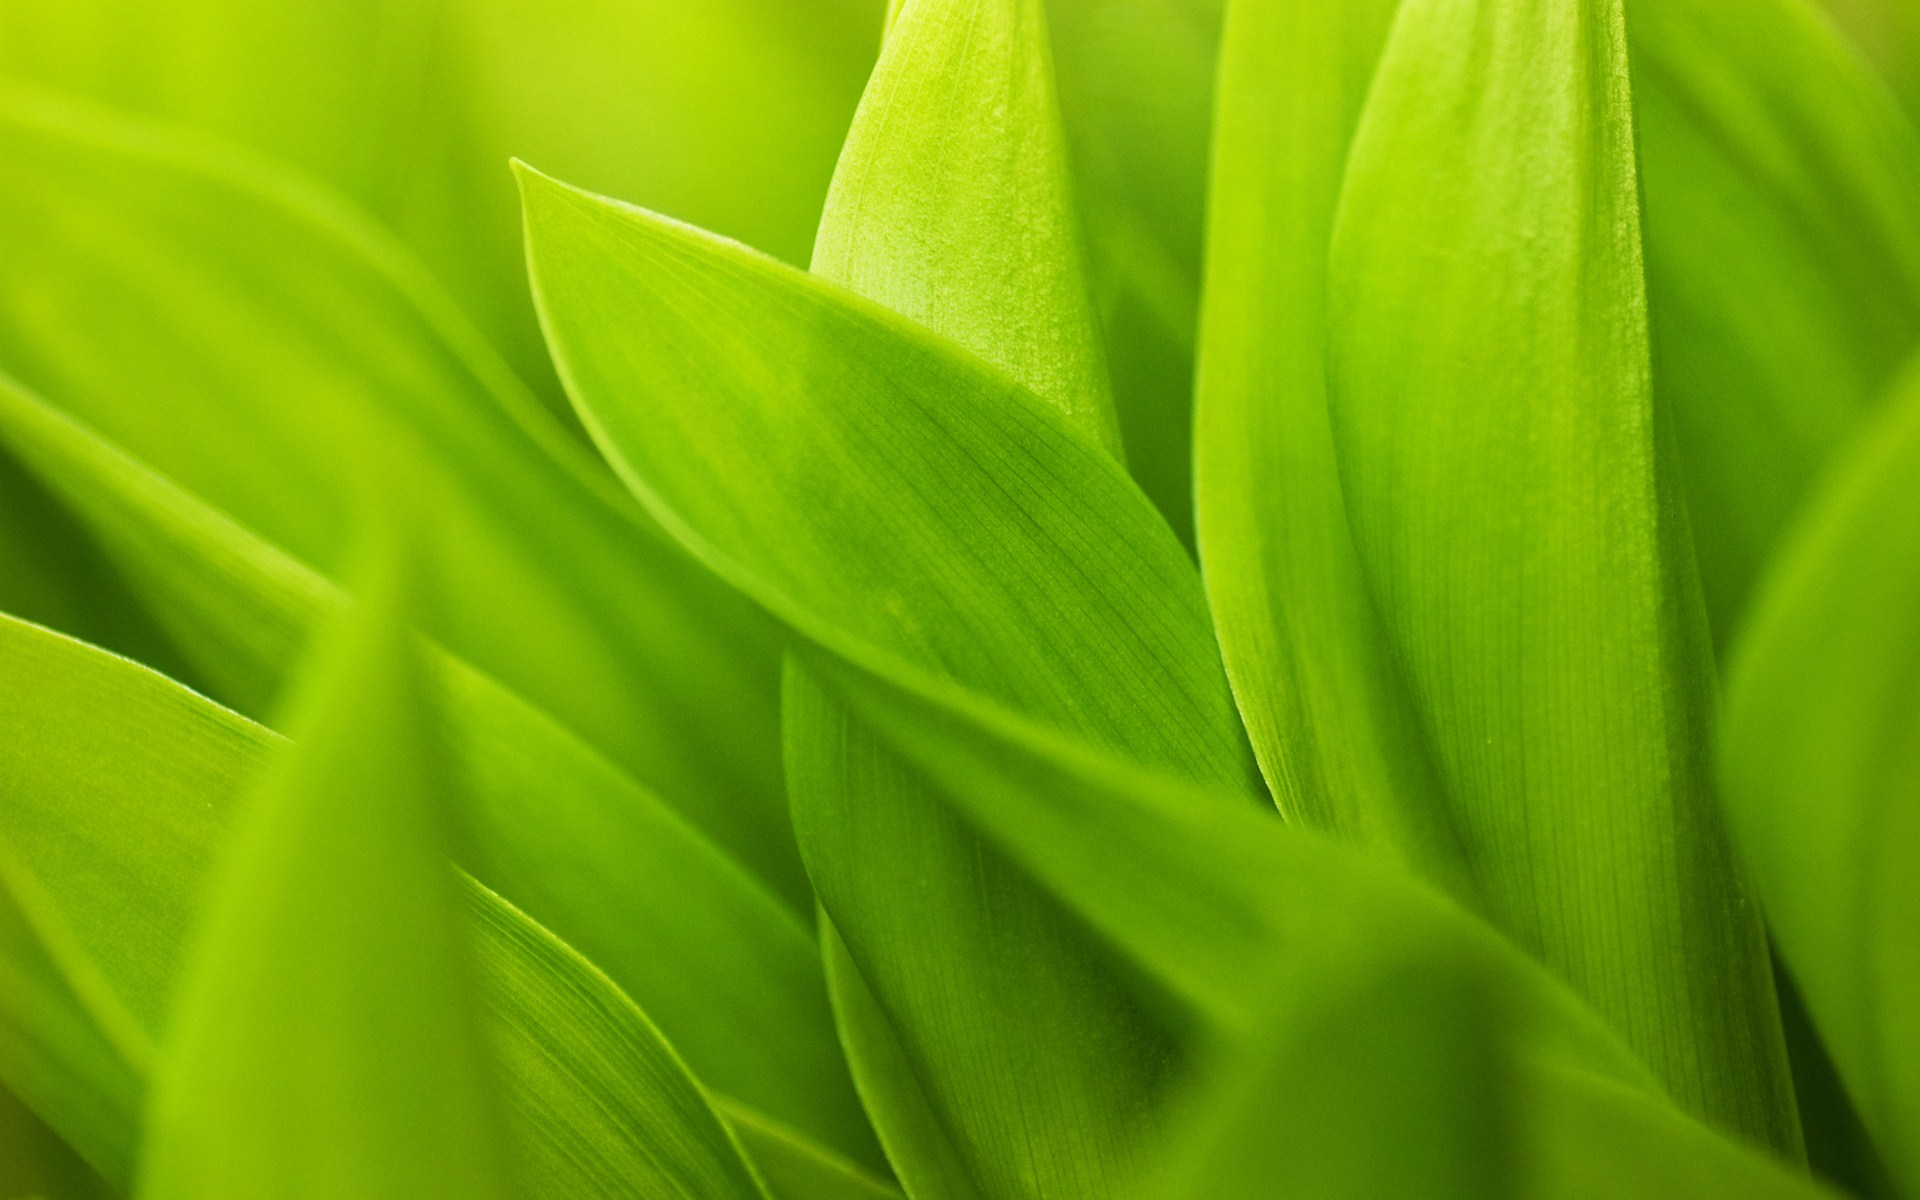 Leaf Macro 39027 1680x1050 px